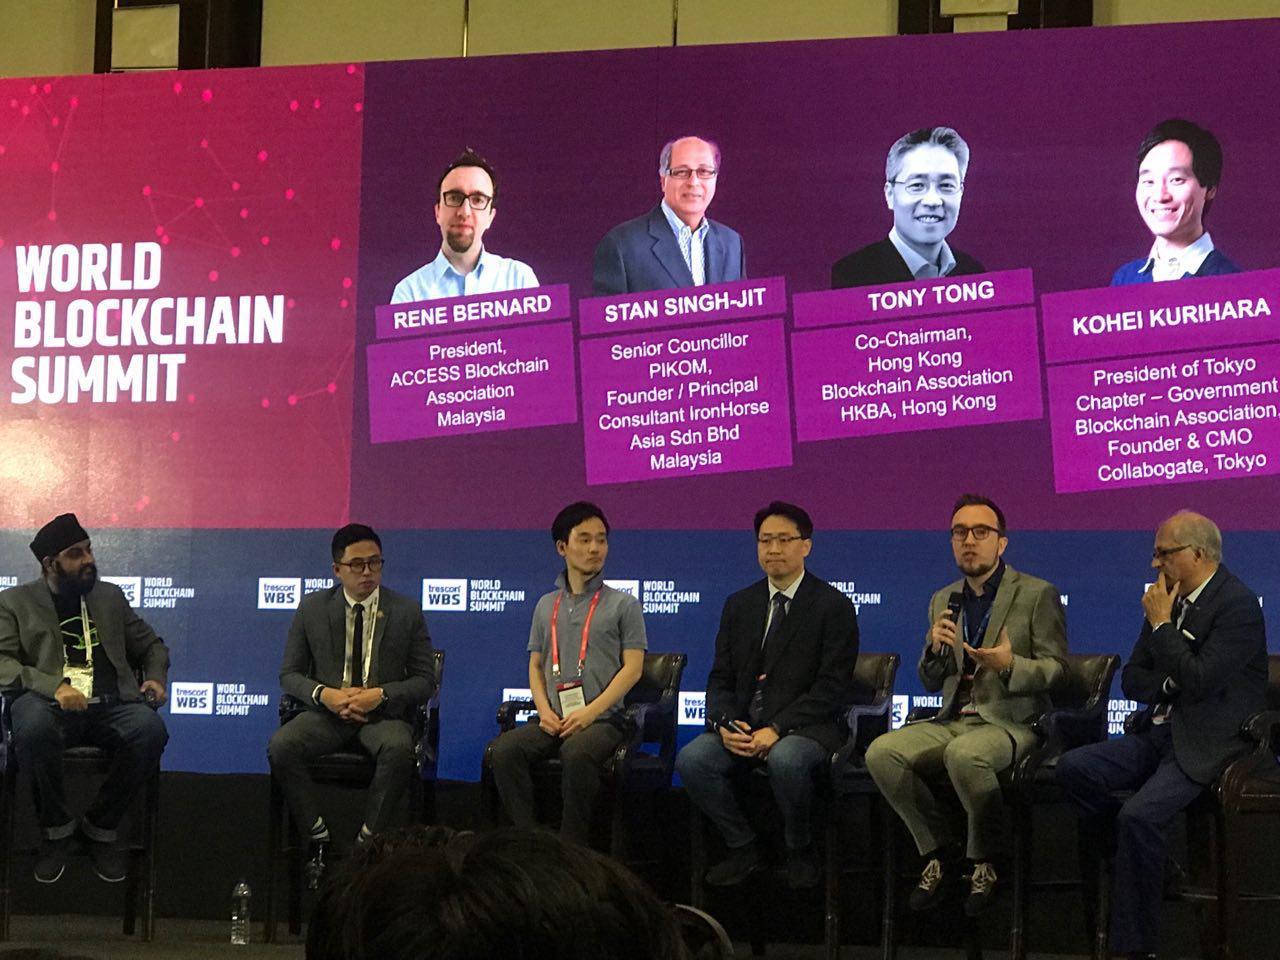 LuxTag takes part in World Blockchain Summit 2019